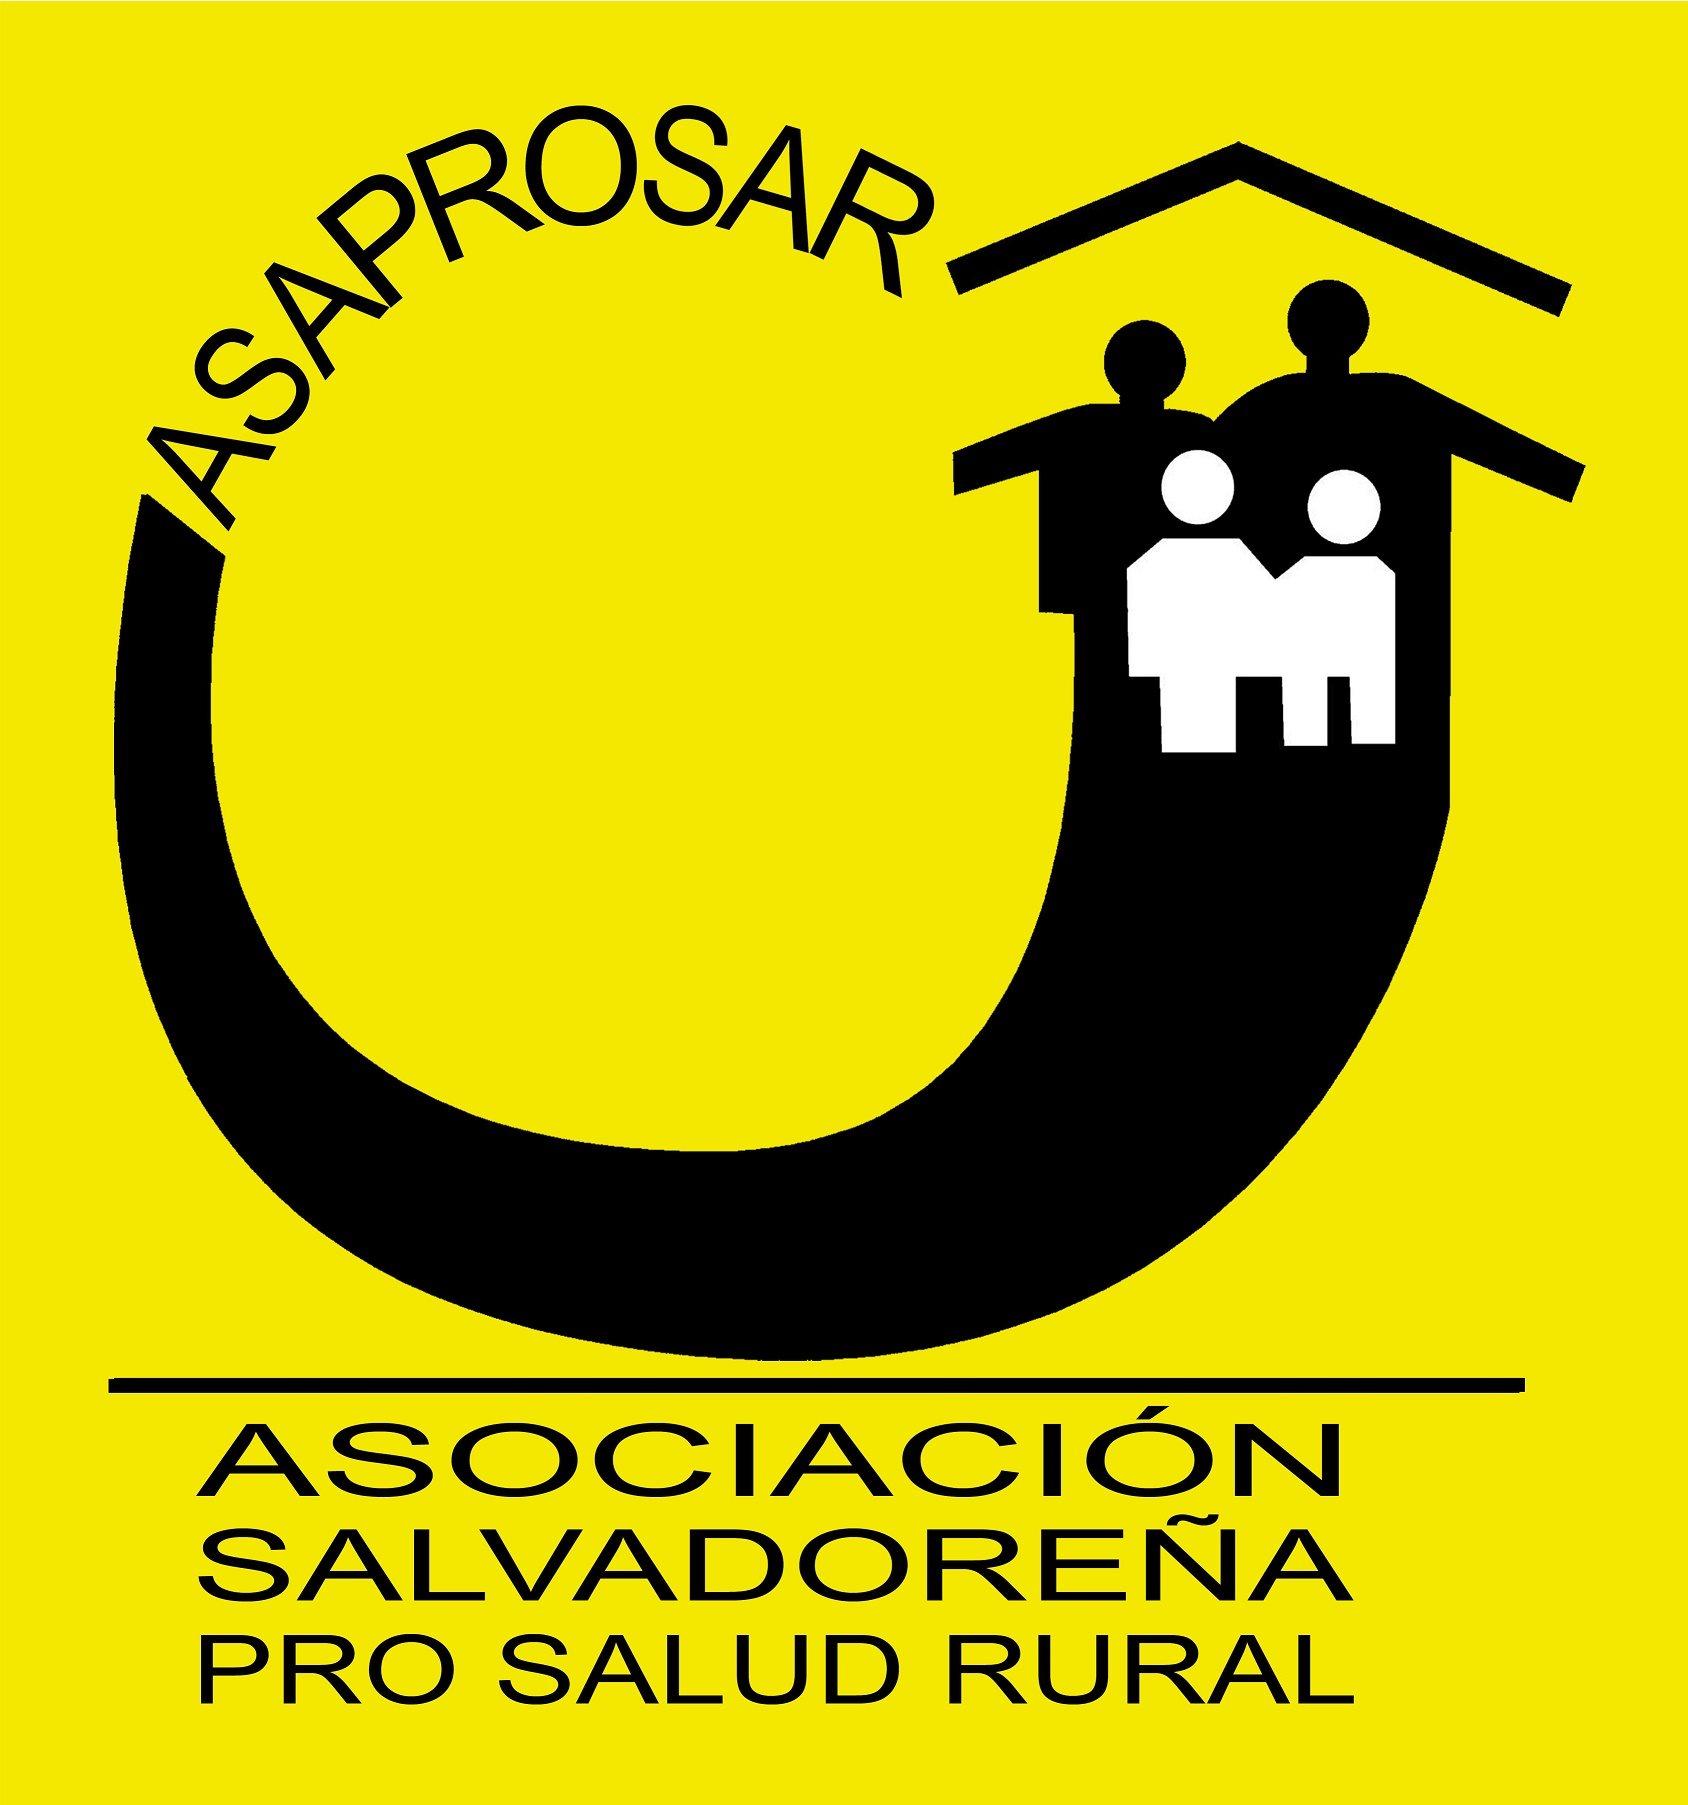 Asociación Salvadoreña Pro Salud Rural